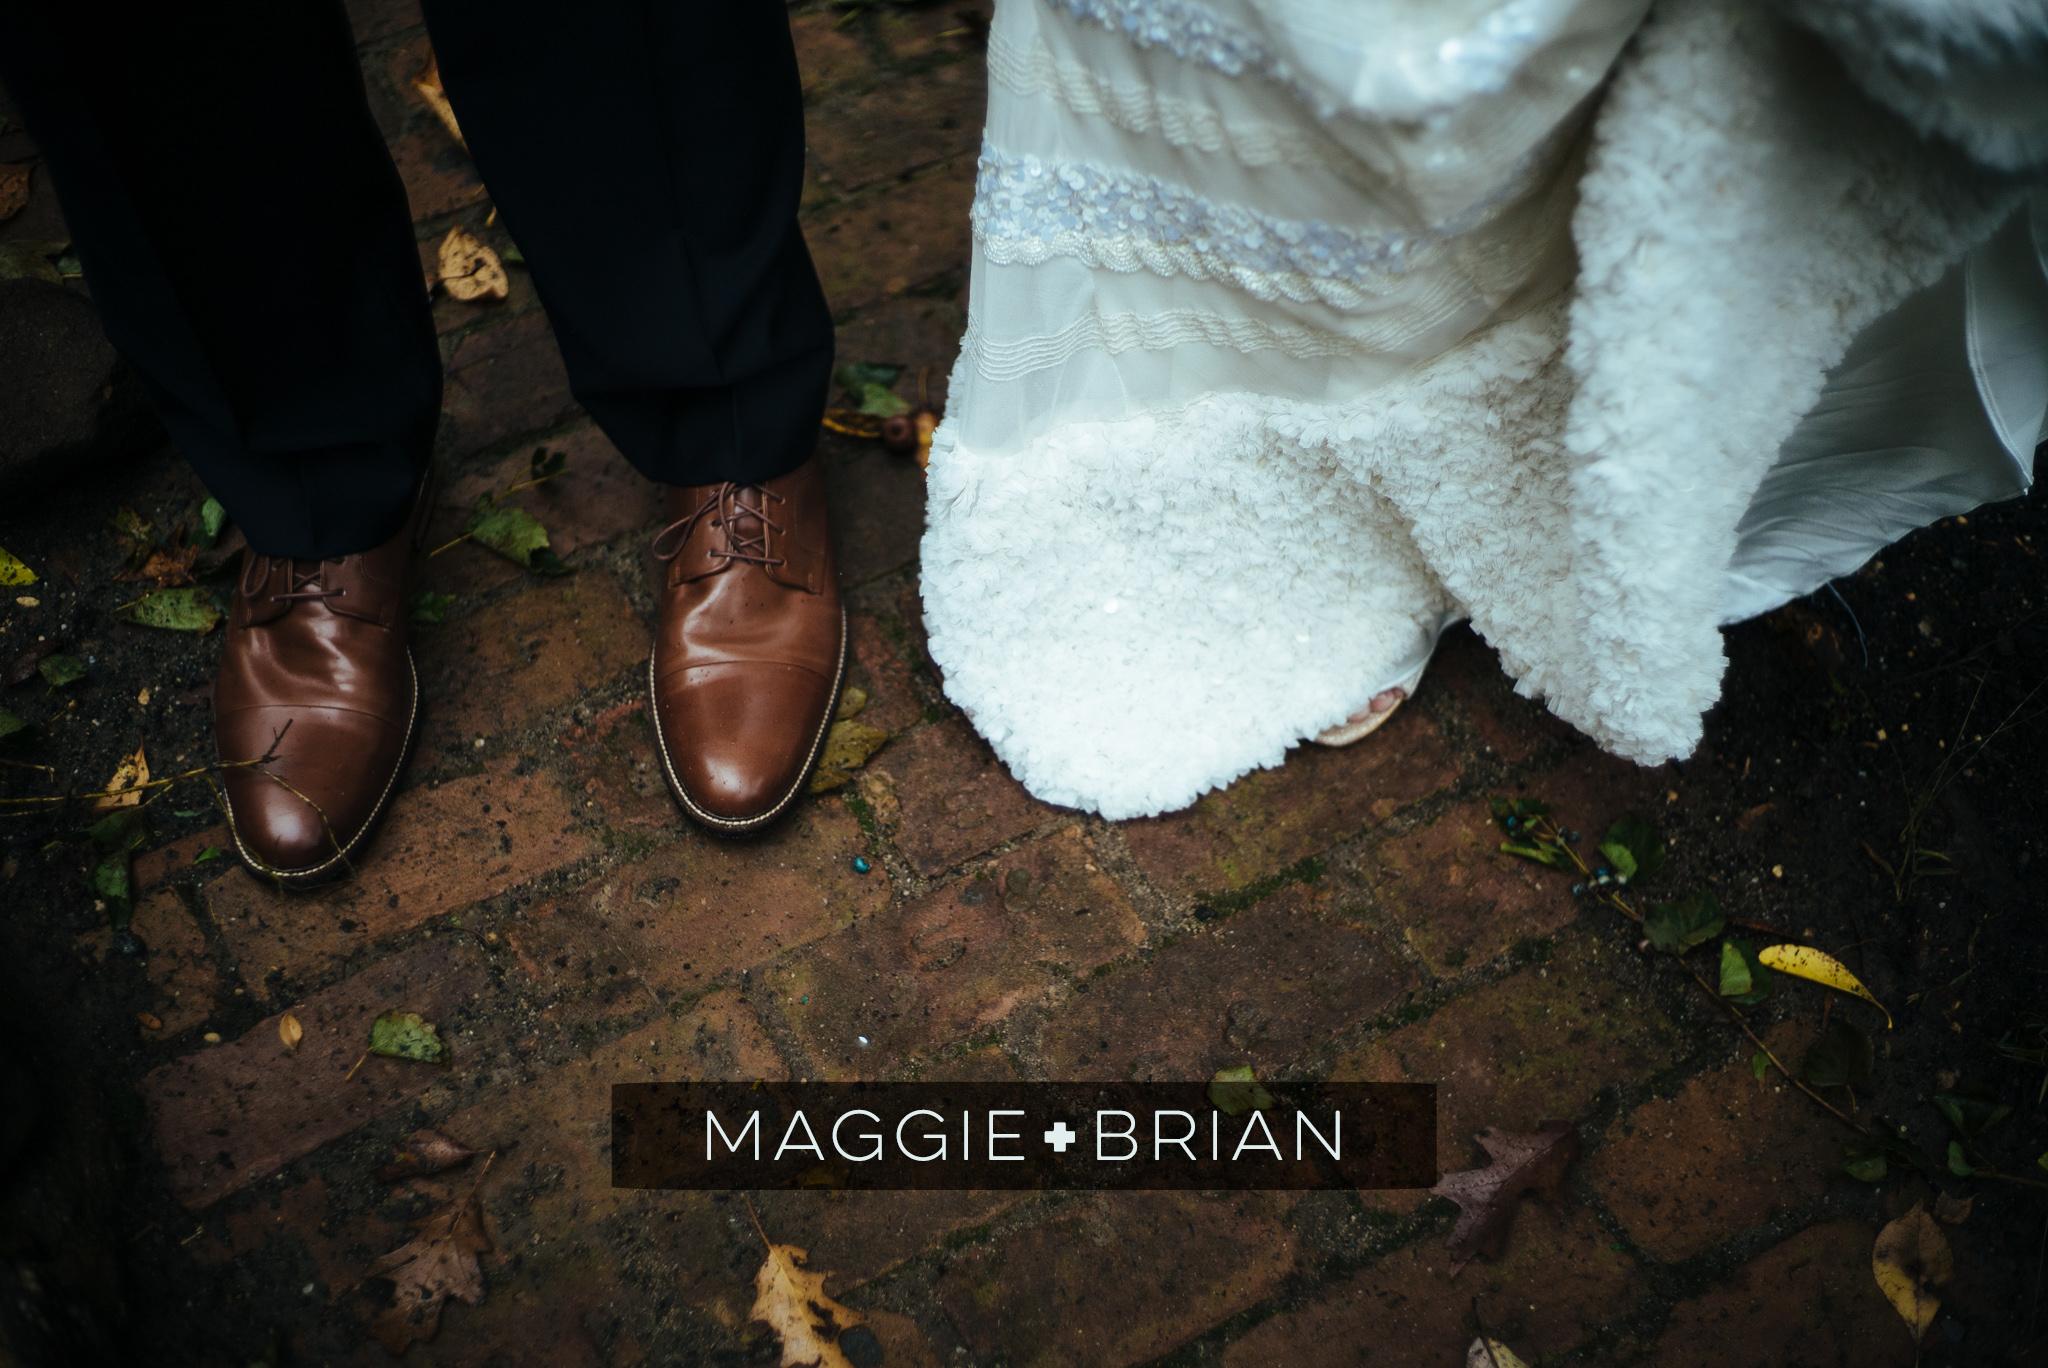 MAGGIE_BRIAN_COVER.jpg